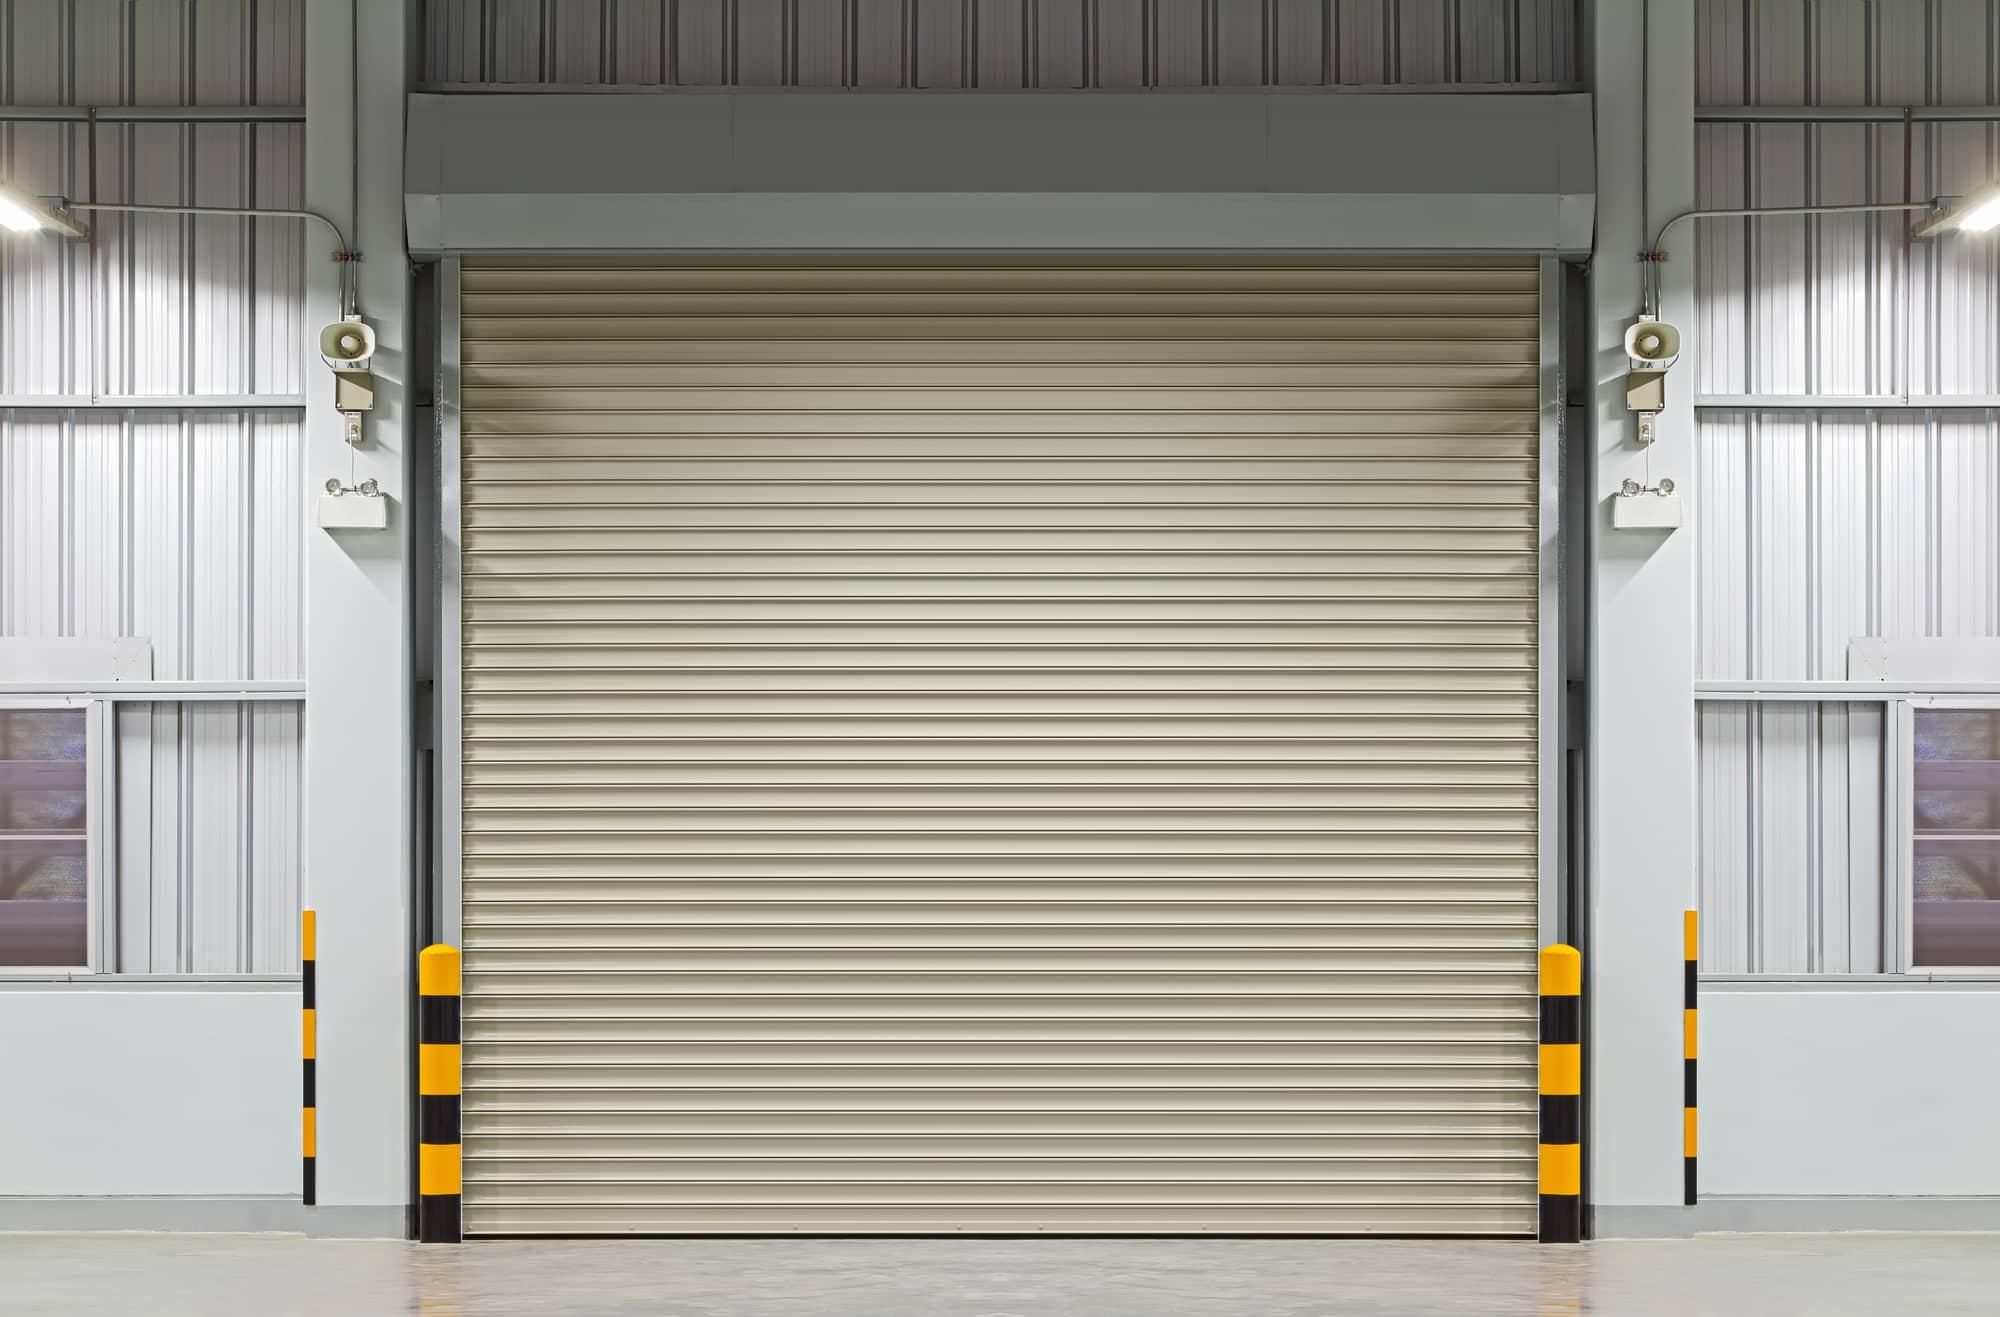 Insulated Roll Up Steel Doors Canuck Door Systems